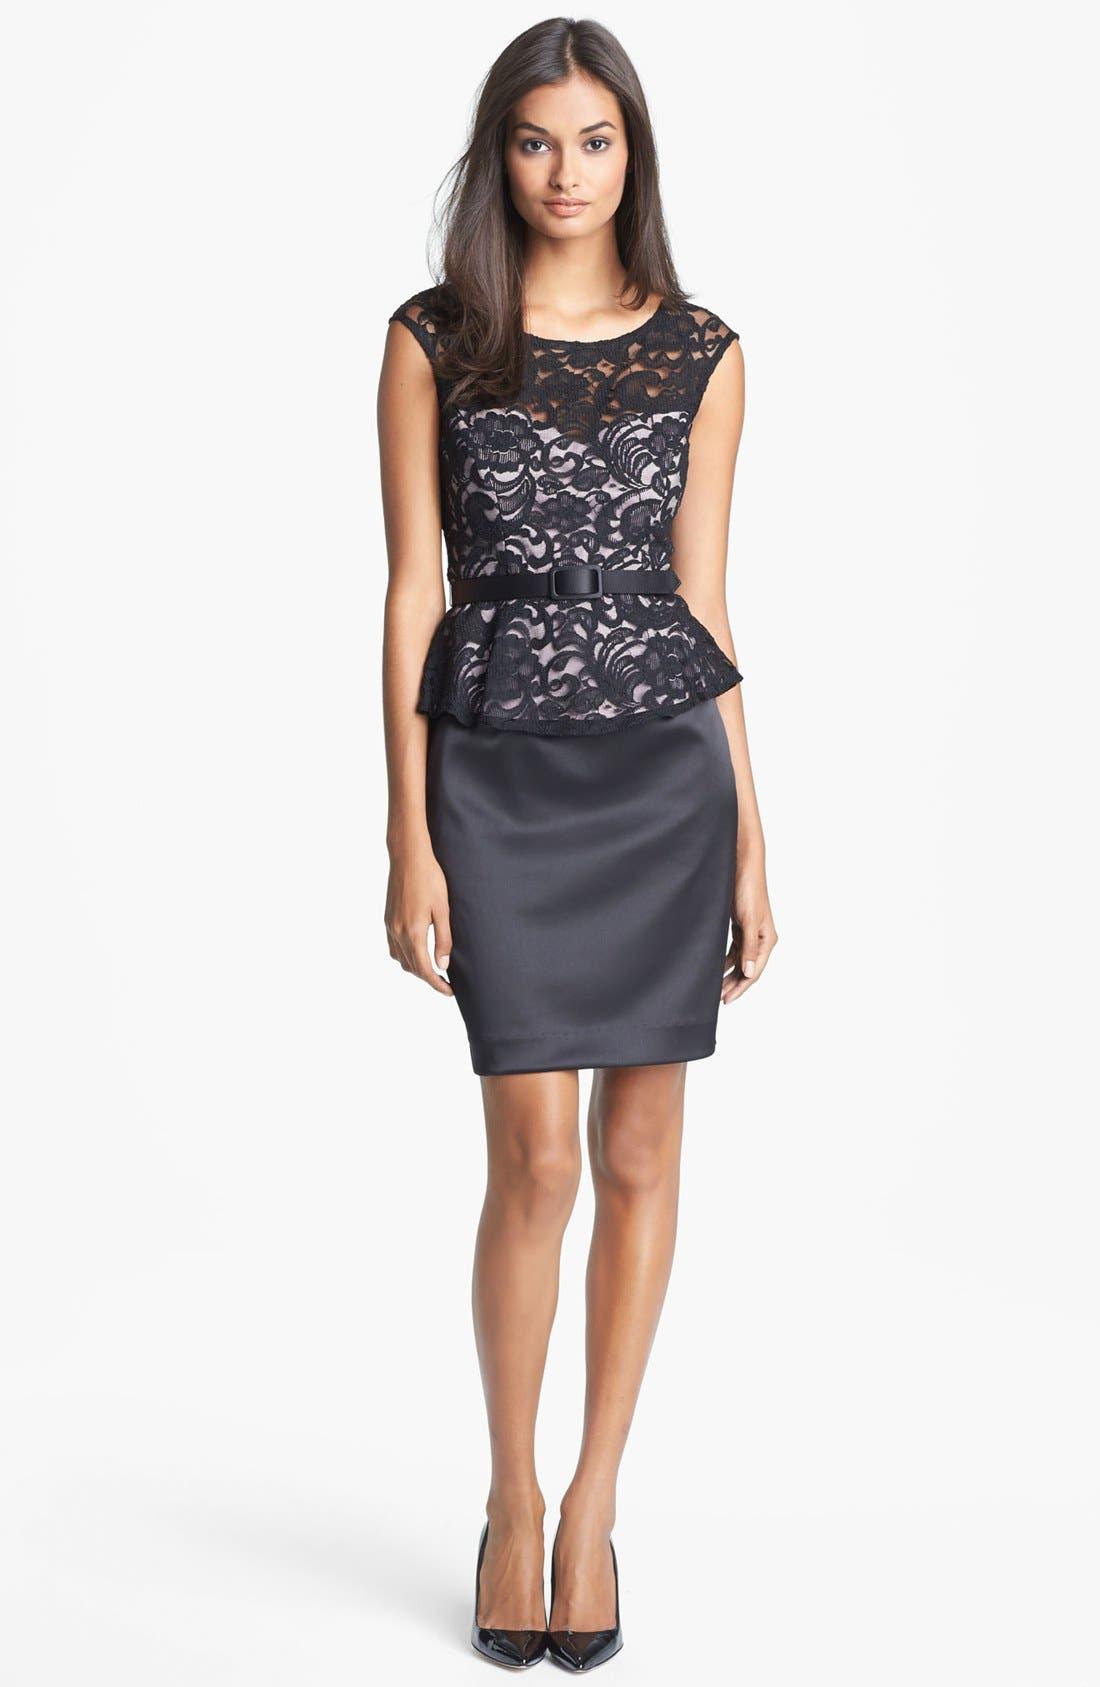 Alternate Image 1 Selected - Xscape Mixed Media Peplum Dress (Petite)